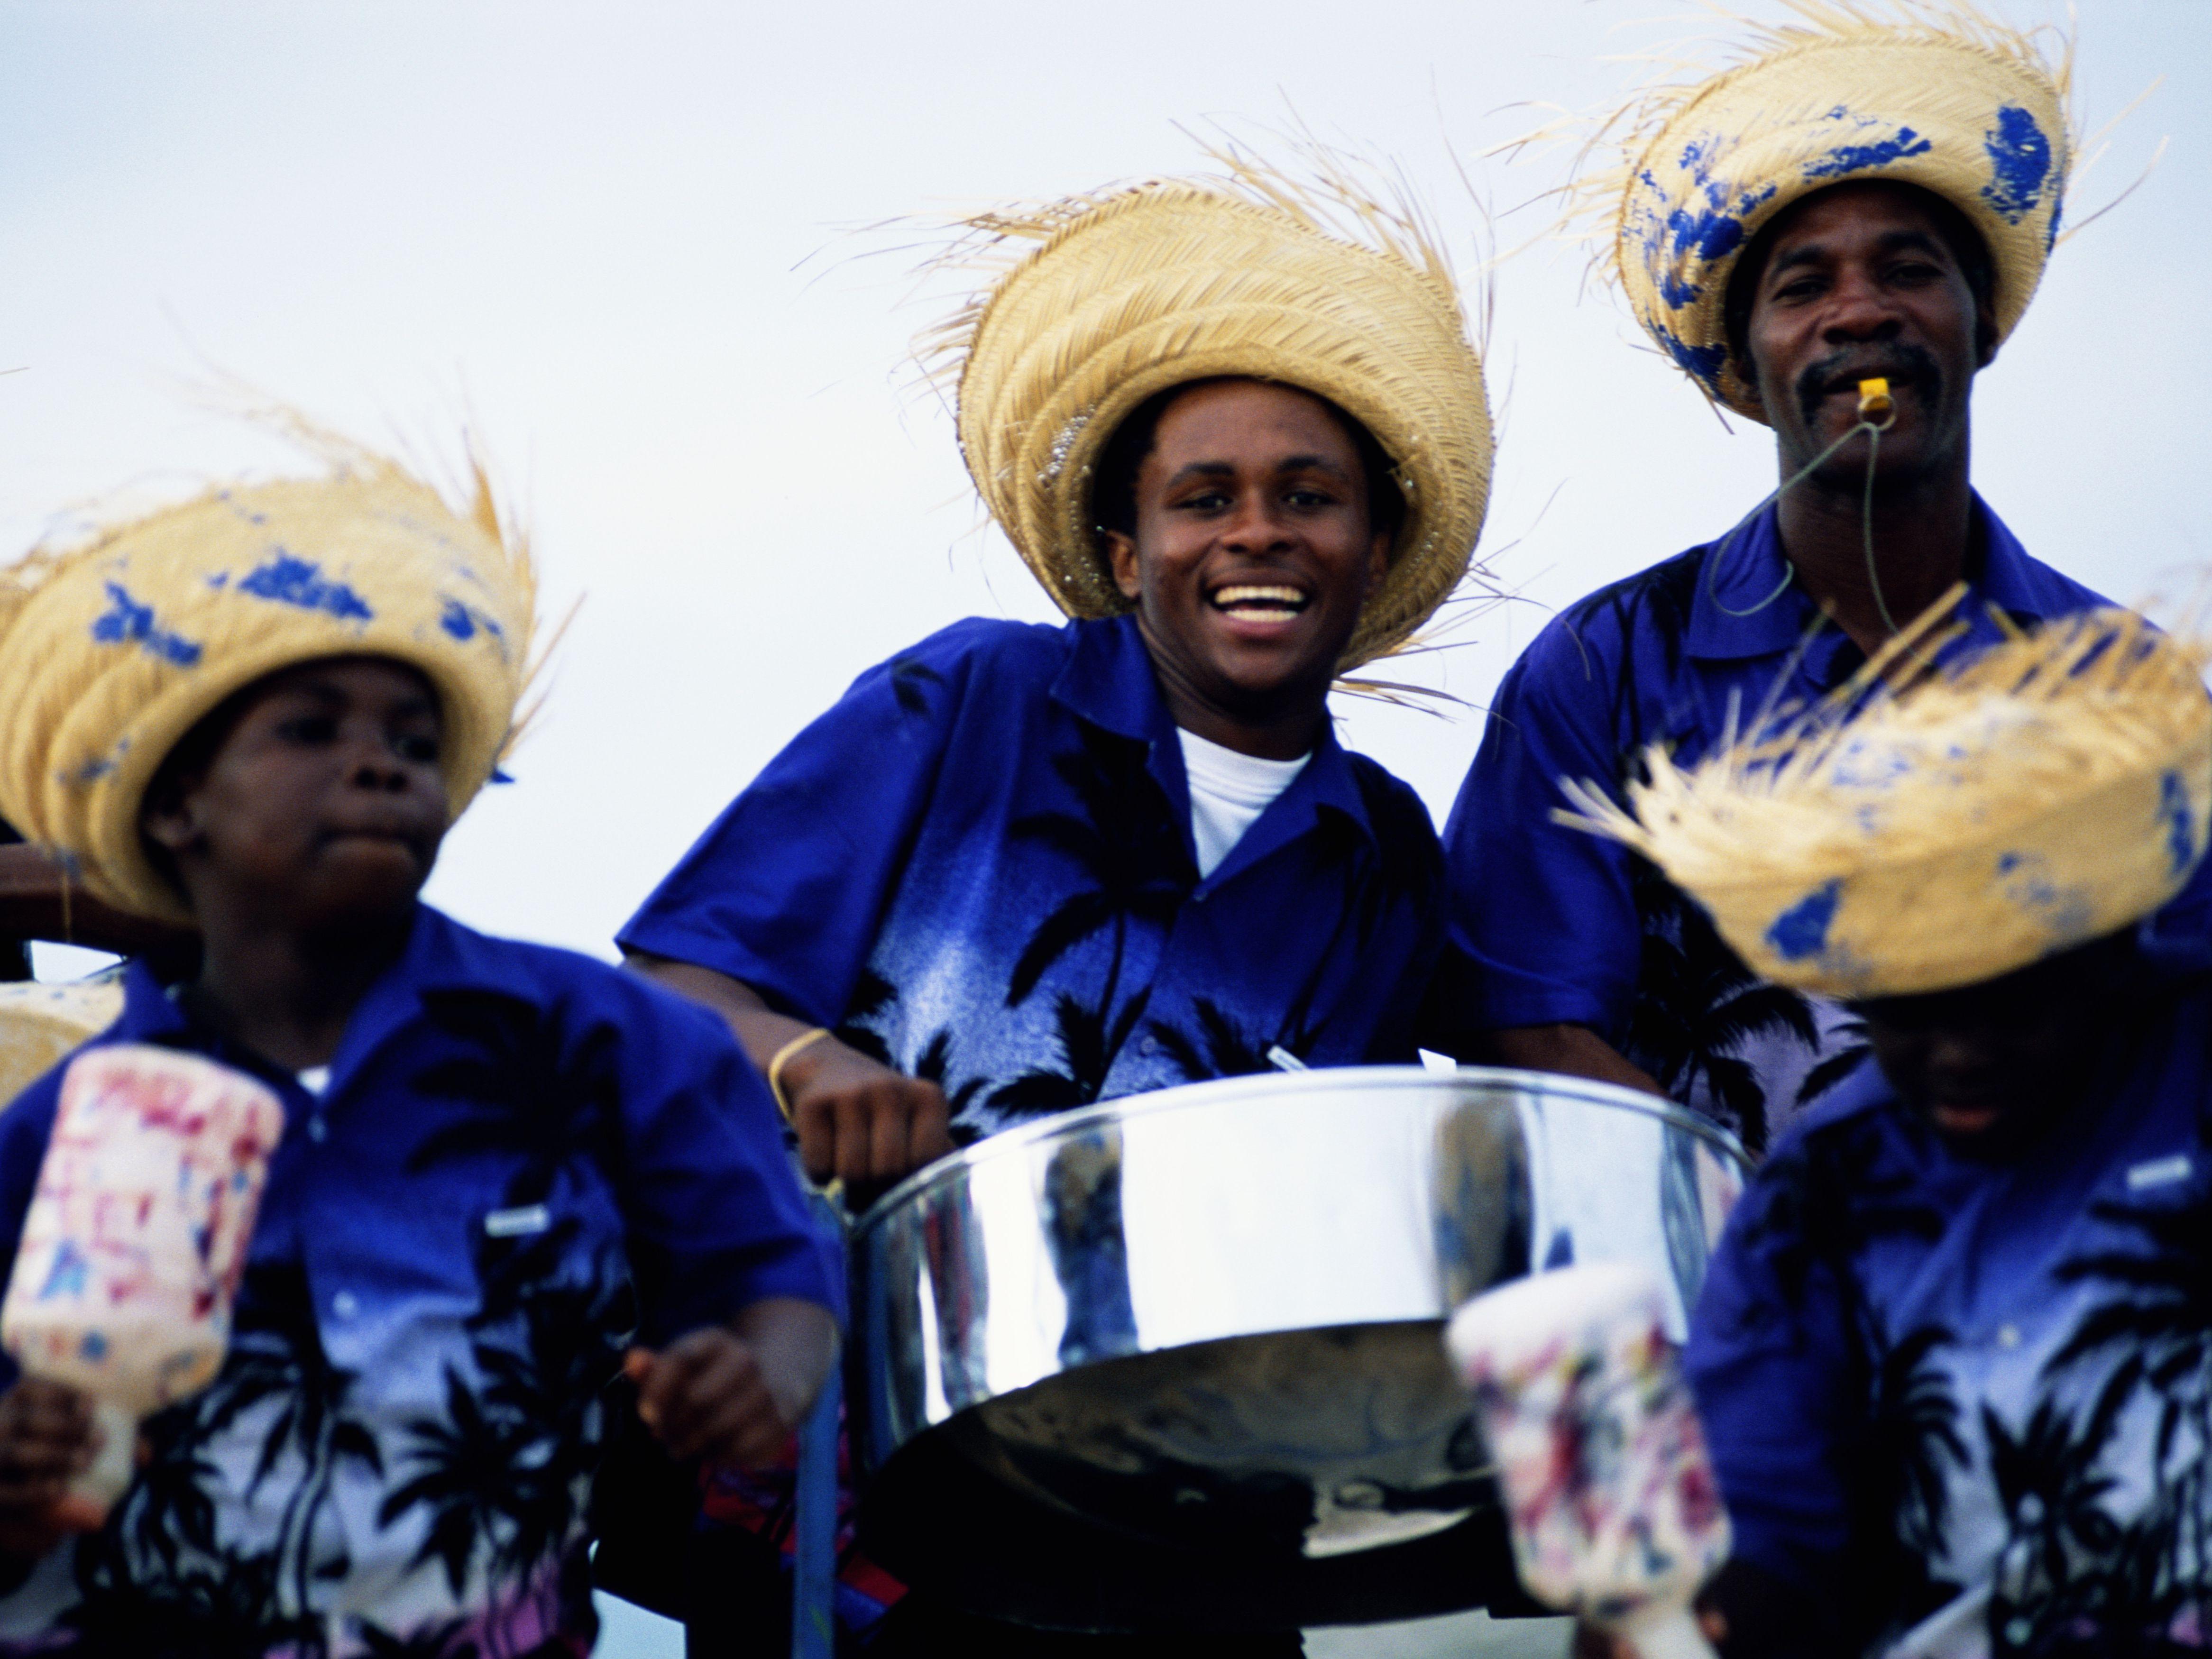 Beyond Reggae: The Traveler's Guide to Caribbean Music